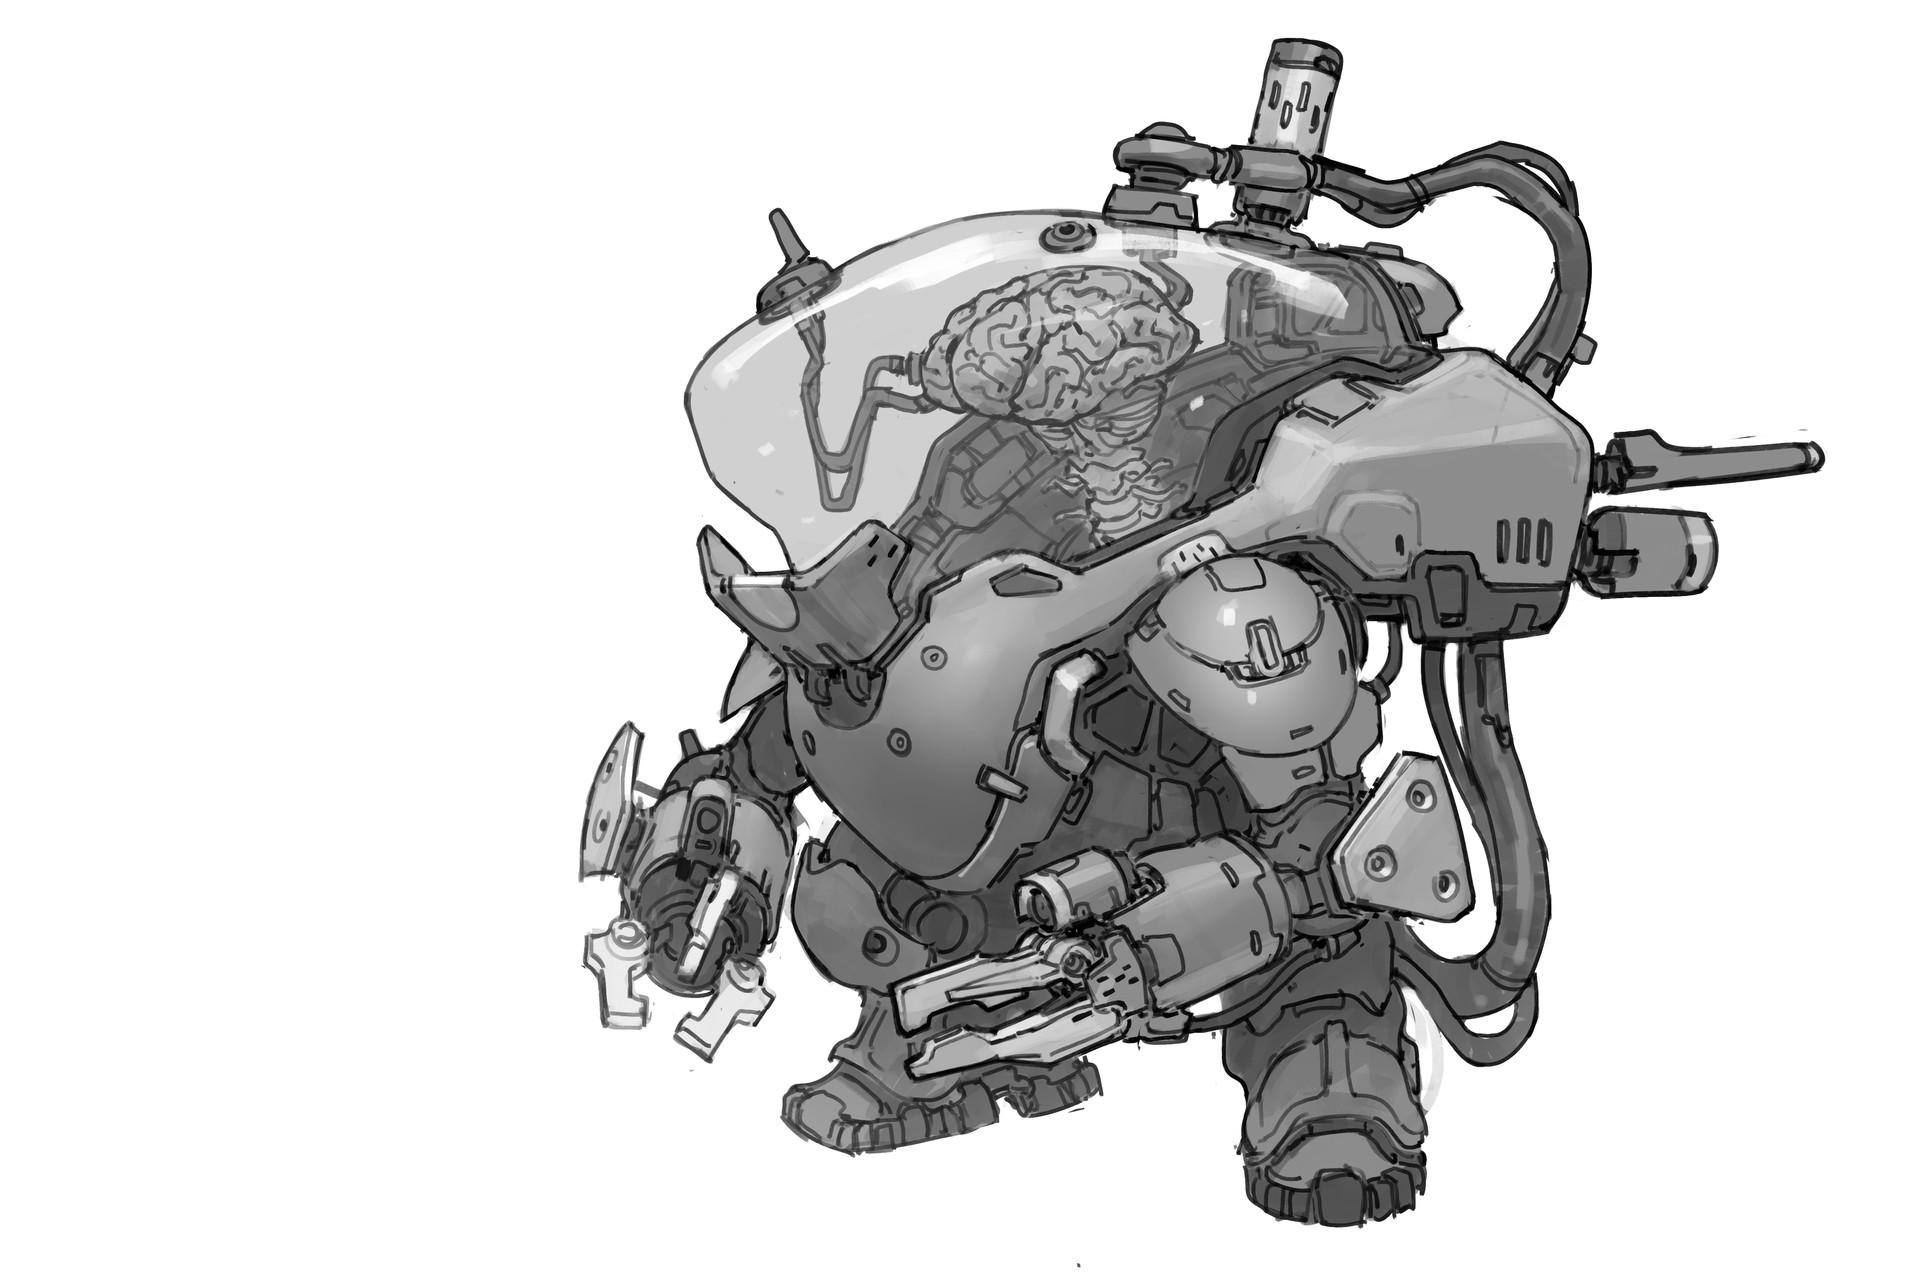 Kory hubbell mechanic pilot 5 wip 1